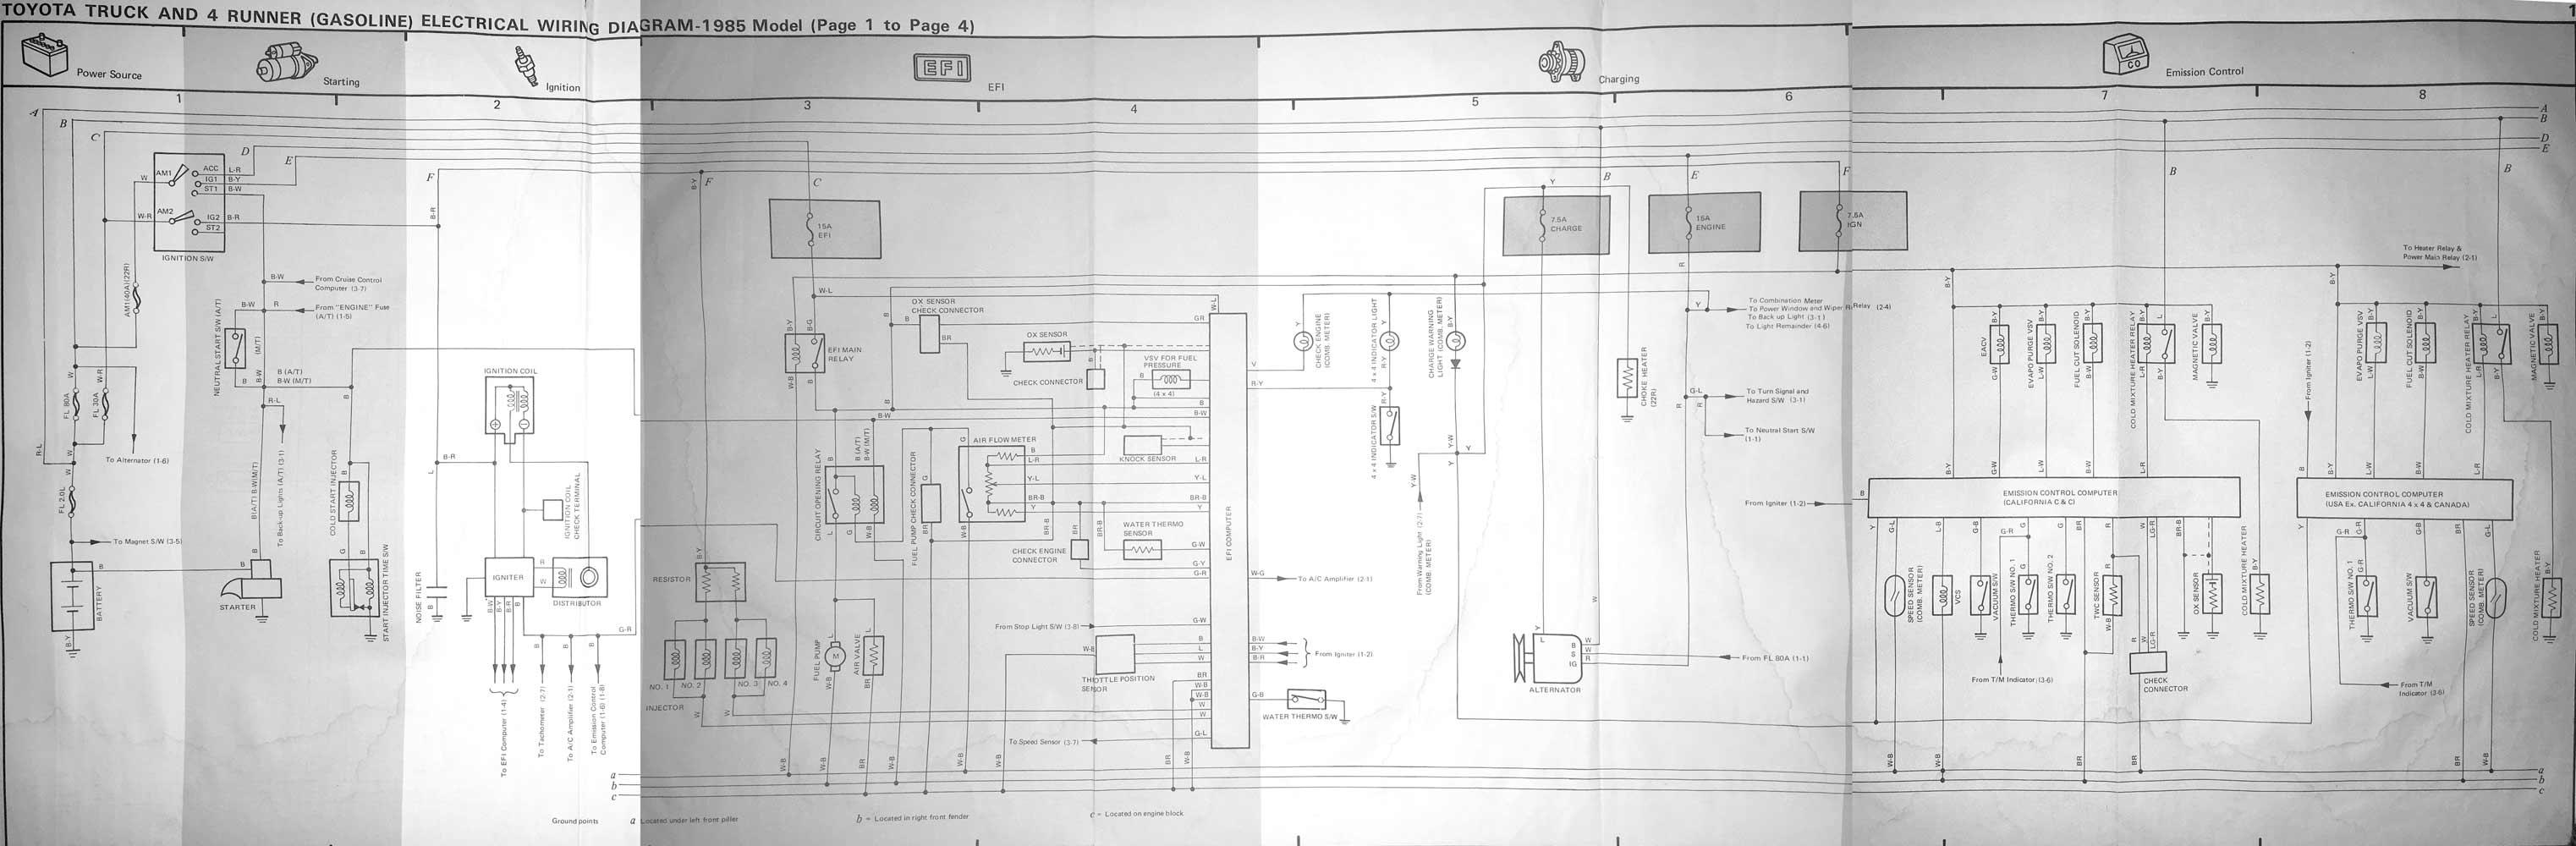 1987 Toyota Pickup Wiring Diagram from 6thgeargarage.net